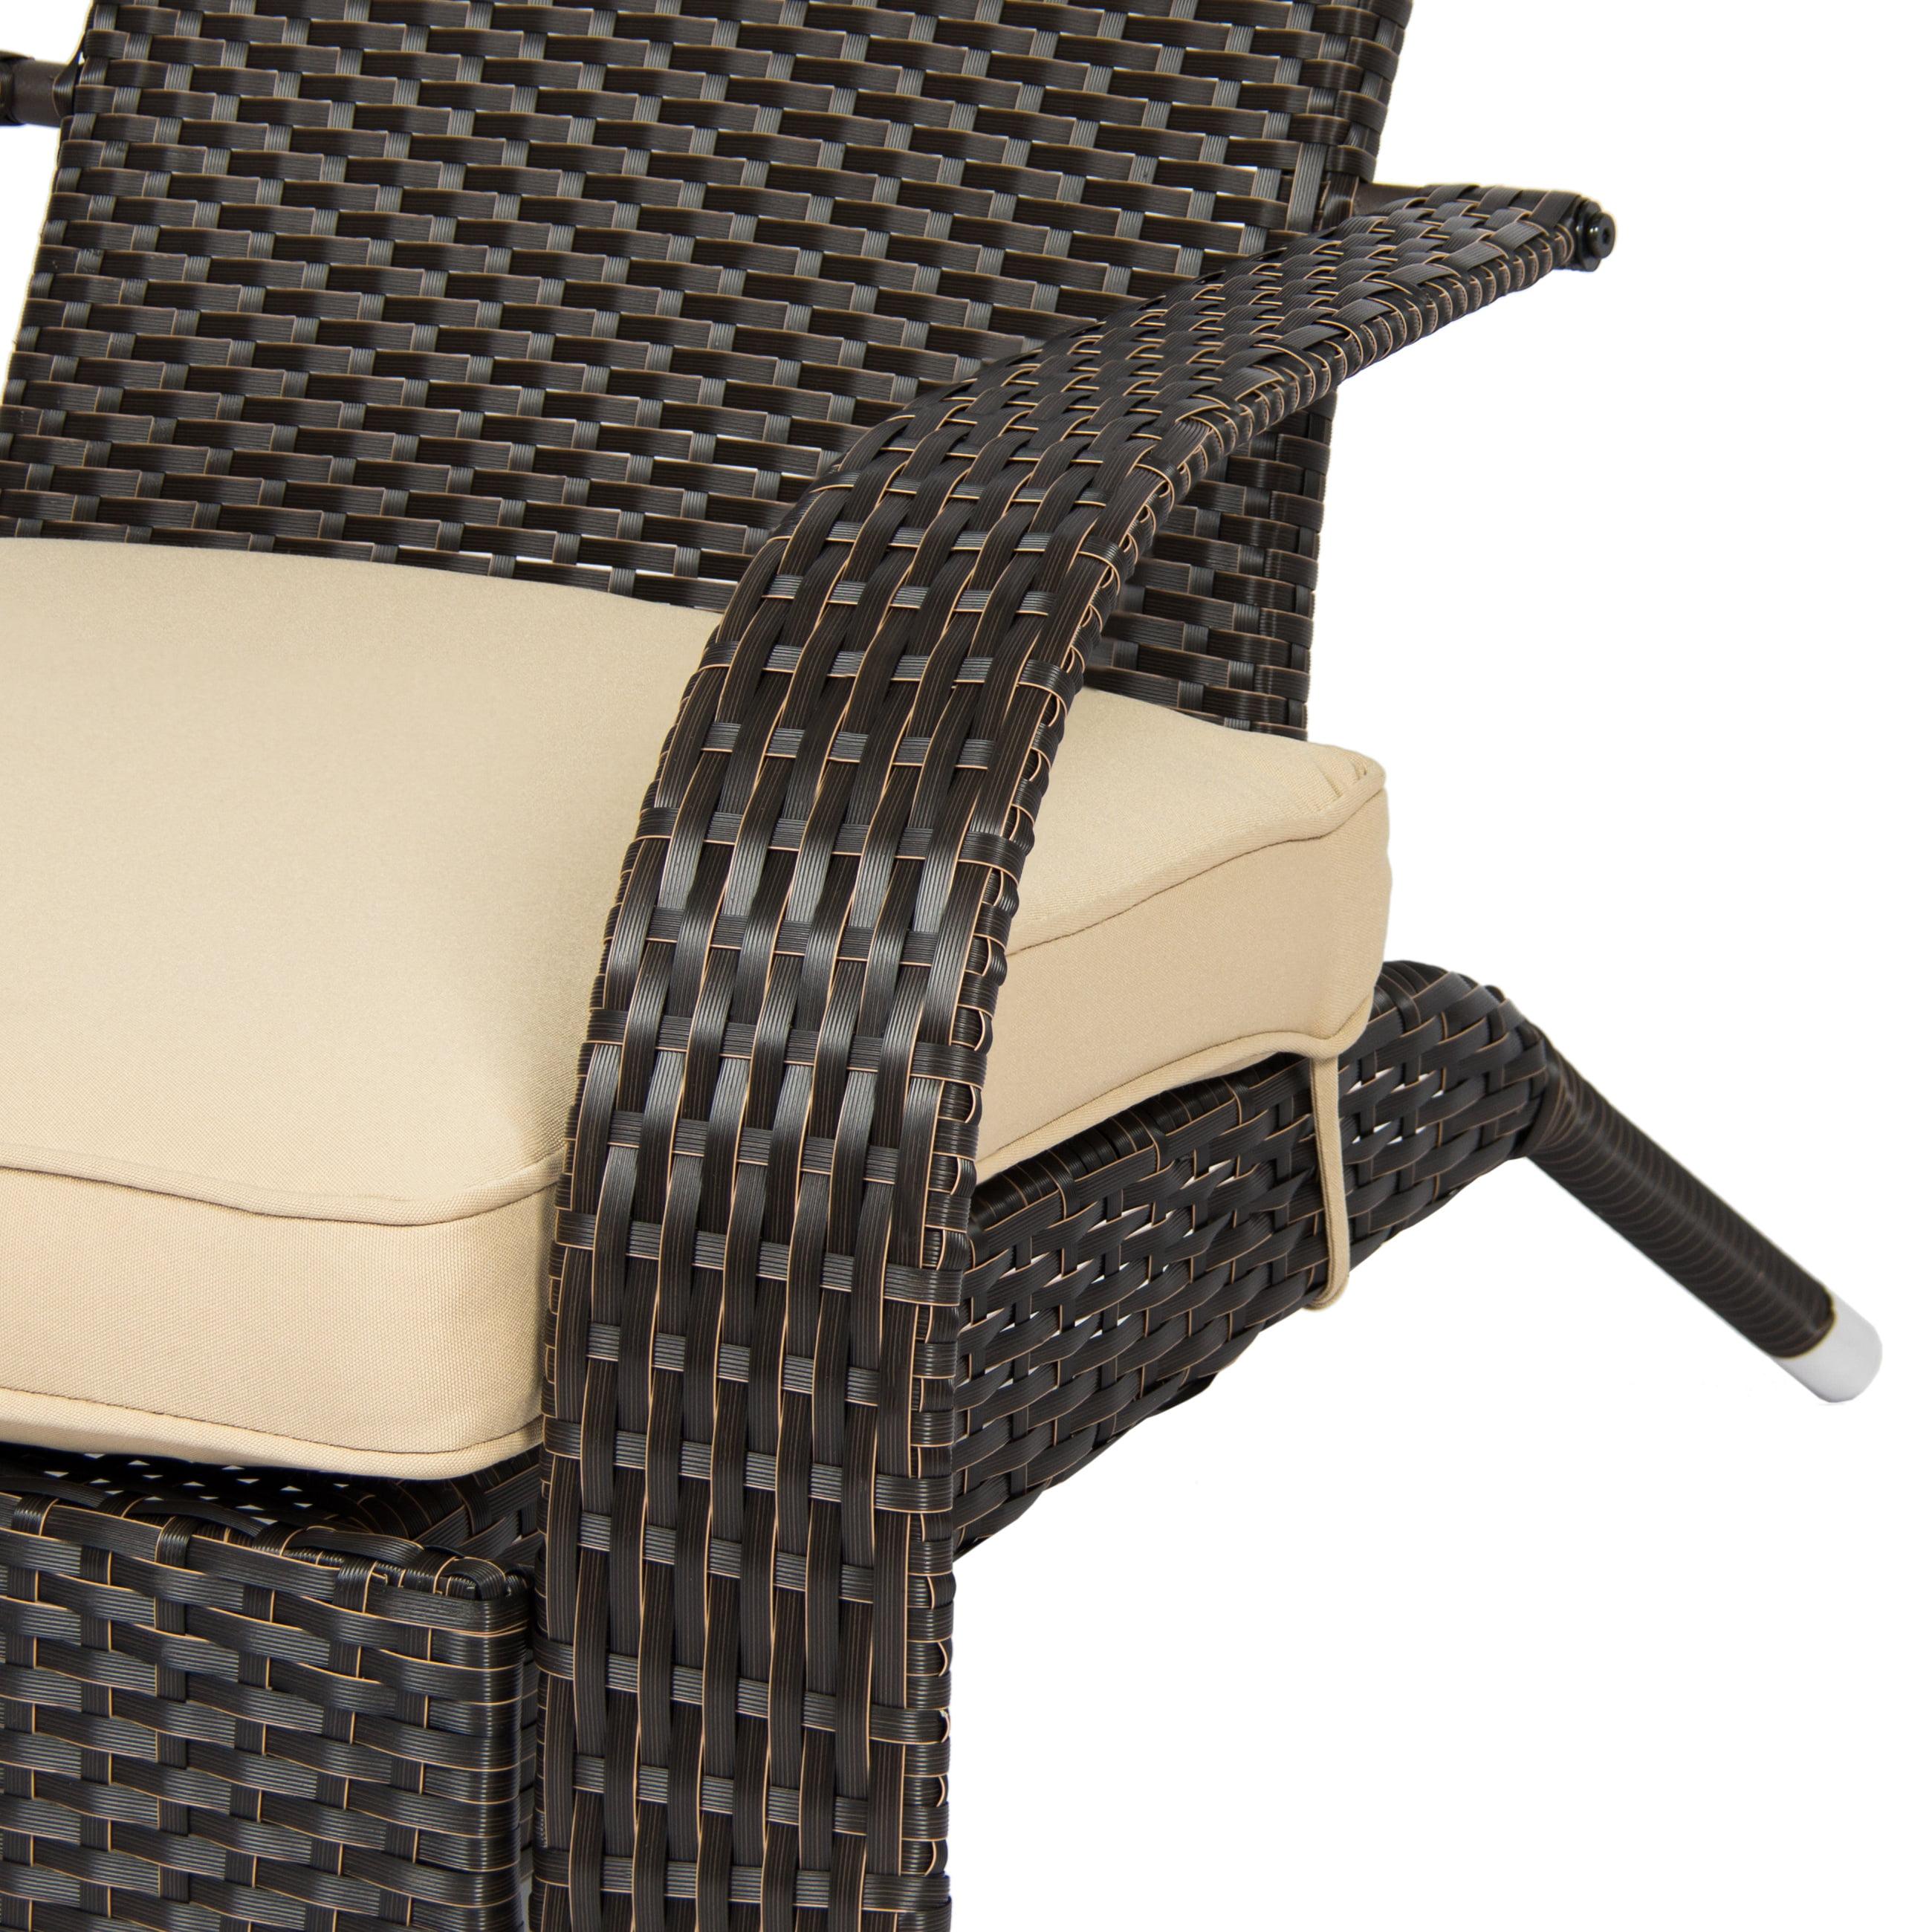 Wicker Adirondack Chair Patio Porch Deck Furniture Outdoor All